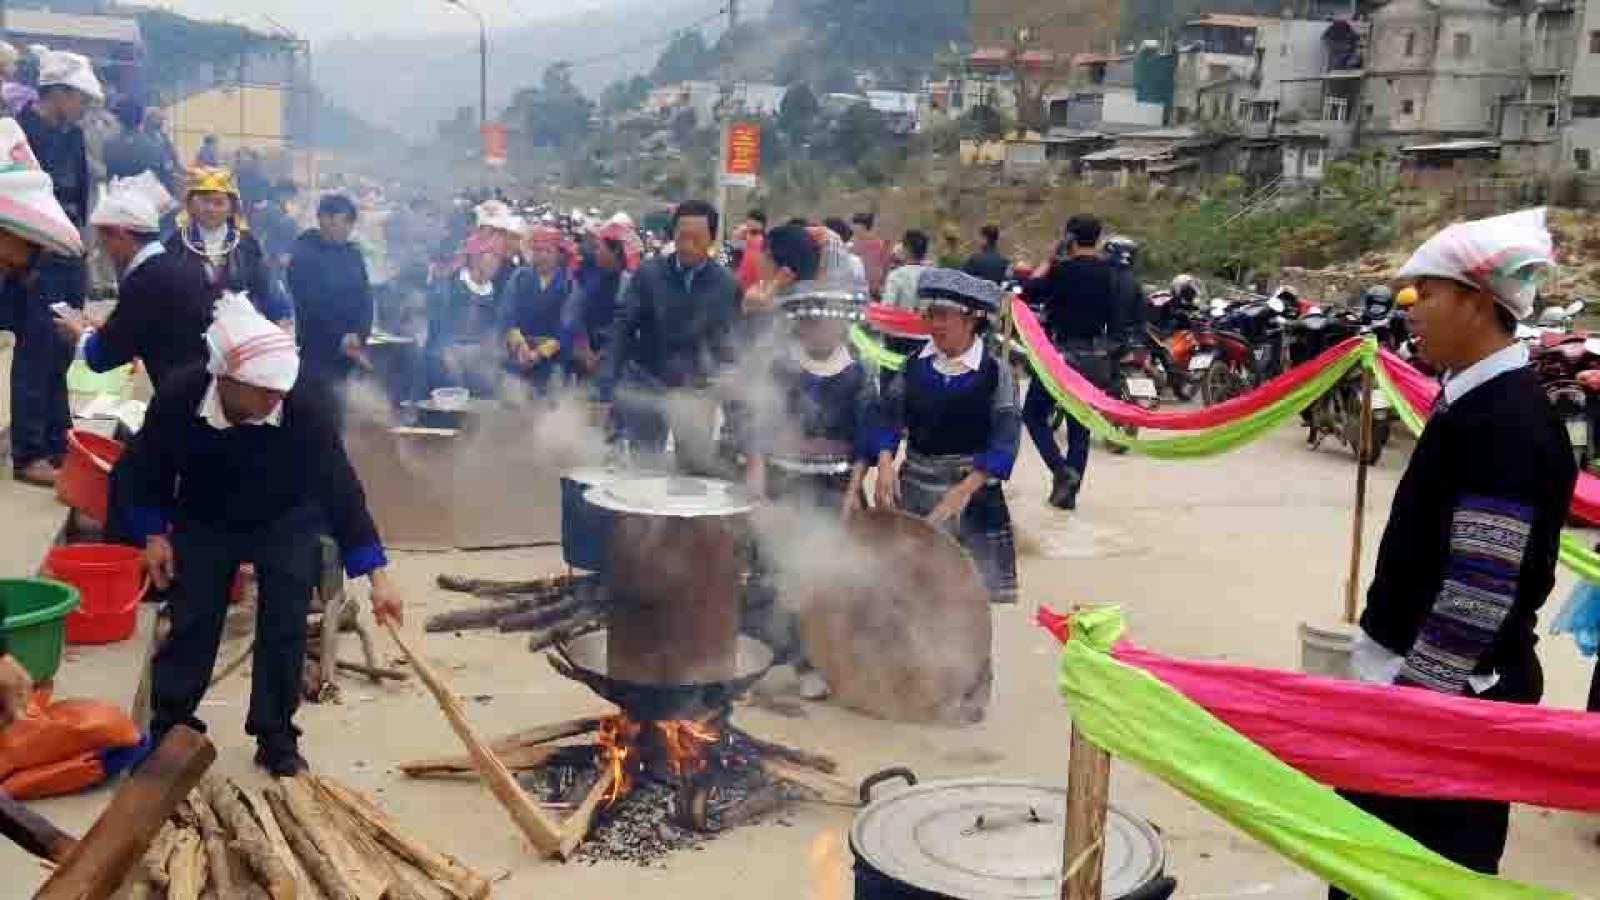 Mong ethnic people celebrate Tet in northern Vietnam